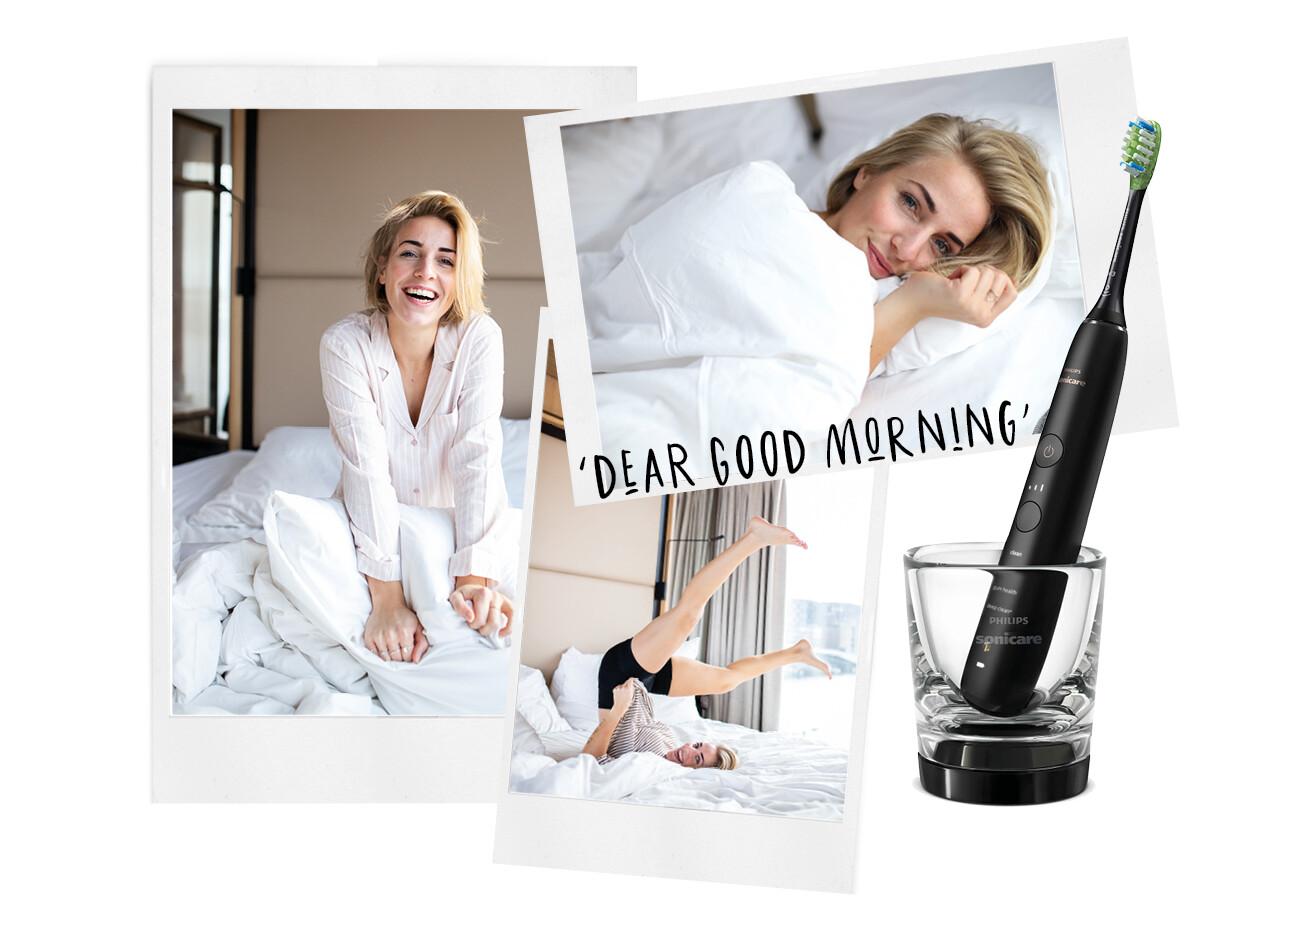 Lienke de Jong dear goodmorning Philips diamond clean tandenborstel